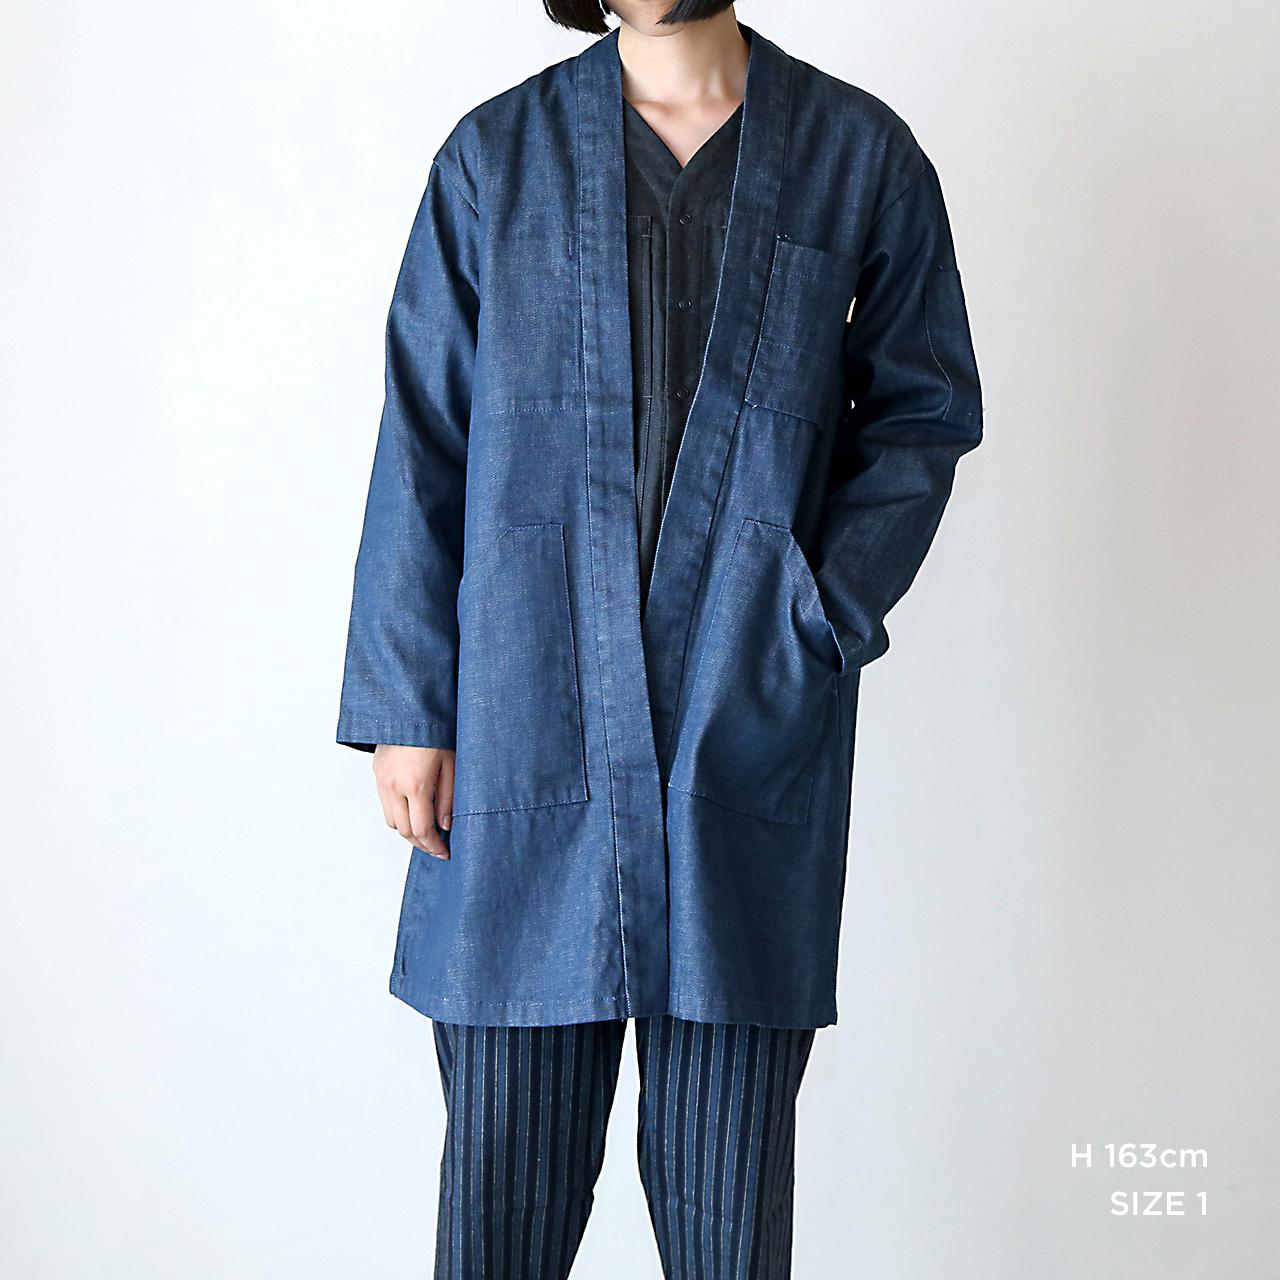 JK-13  伊達羽織  インディゴデニム